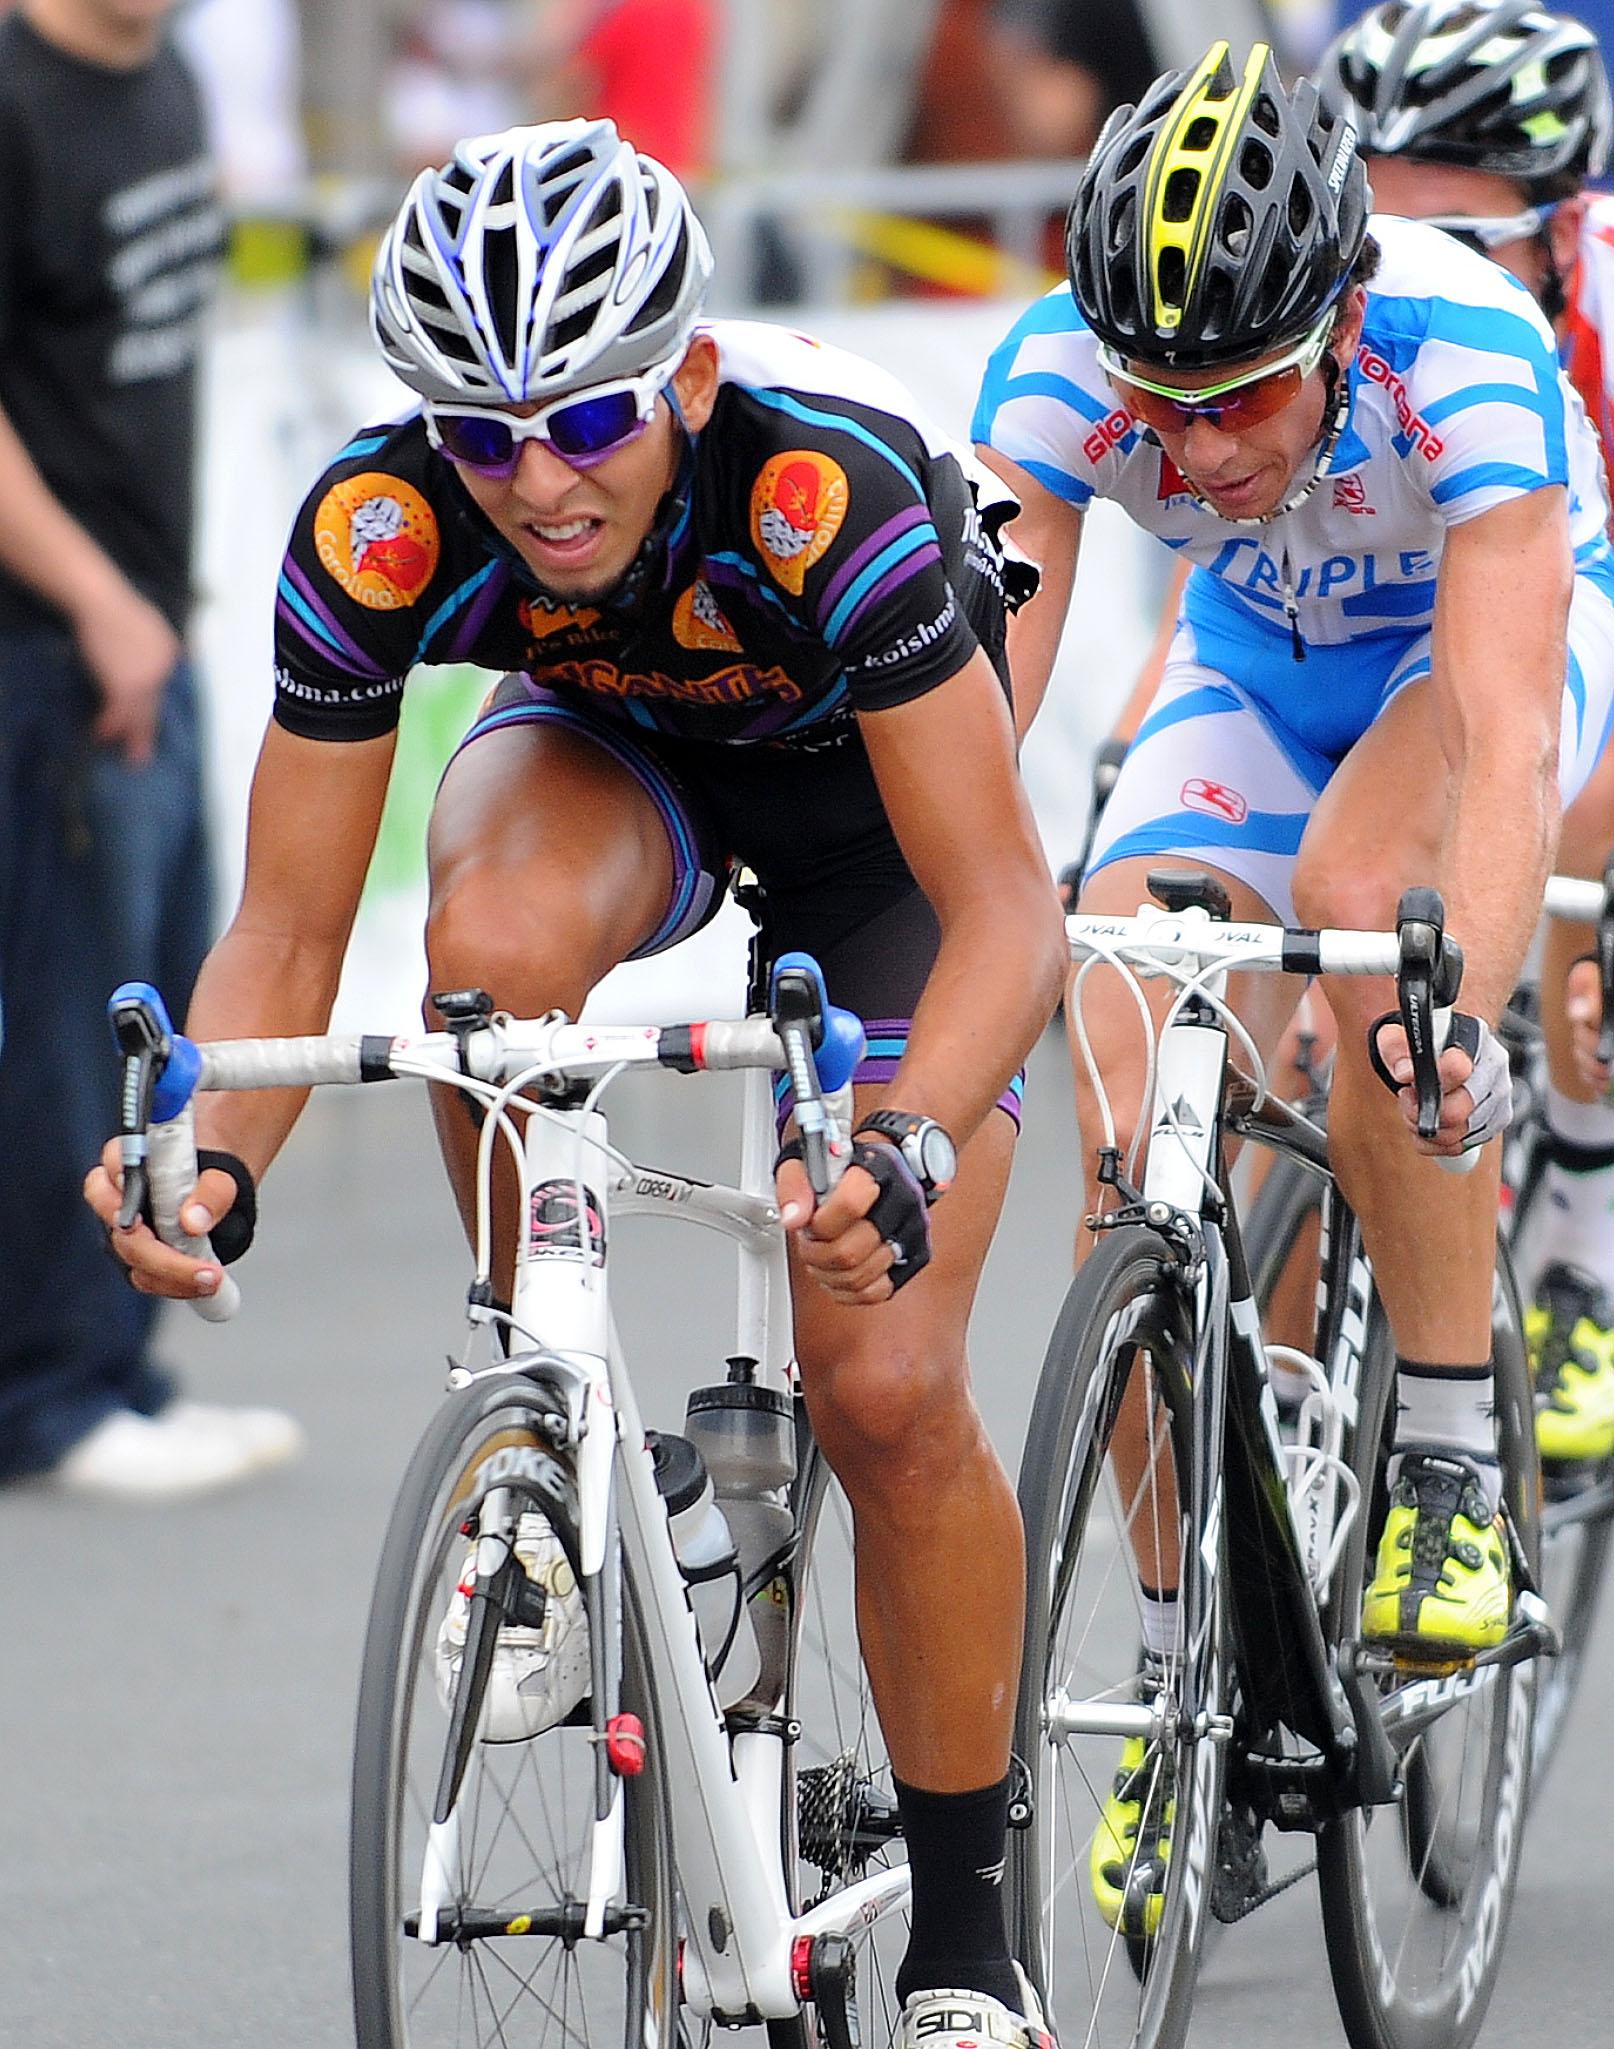 Tito Martinez Carolina Grand Prix-2011